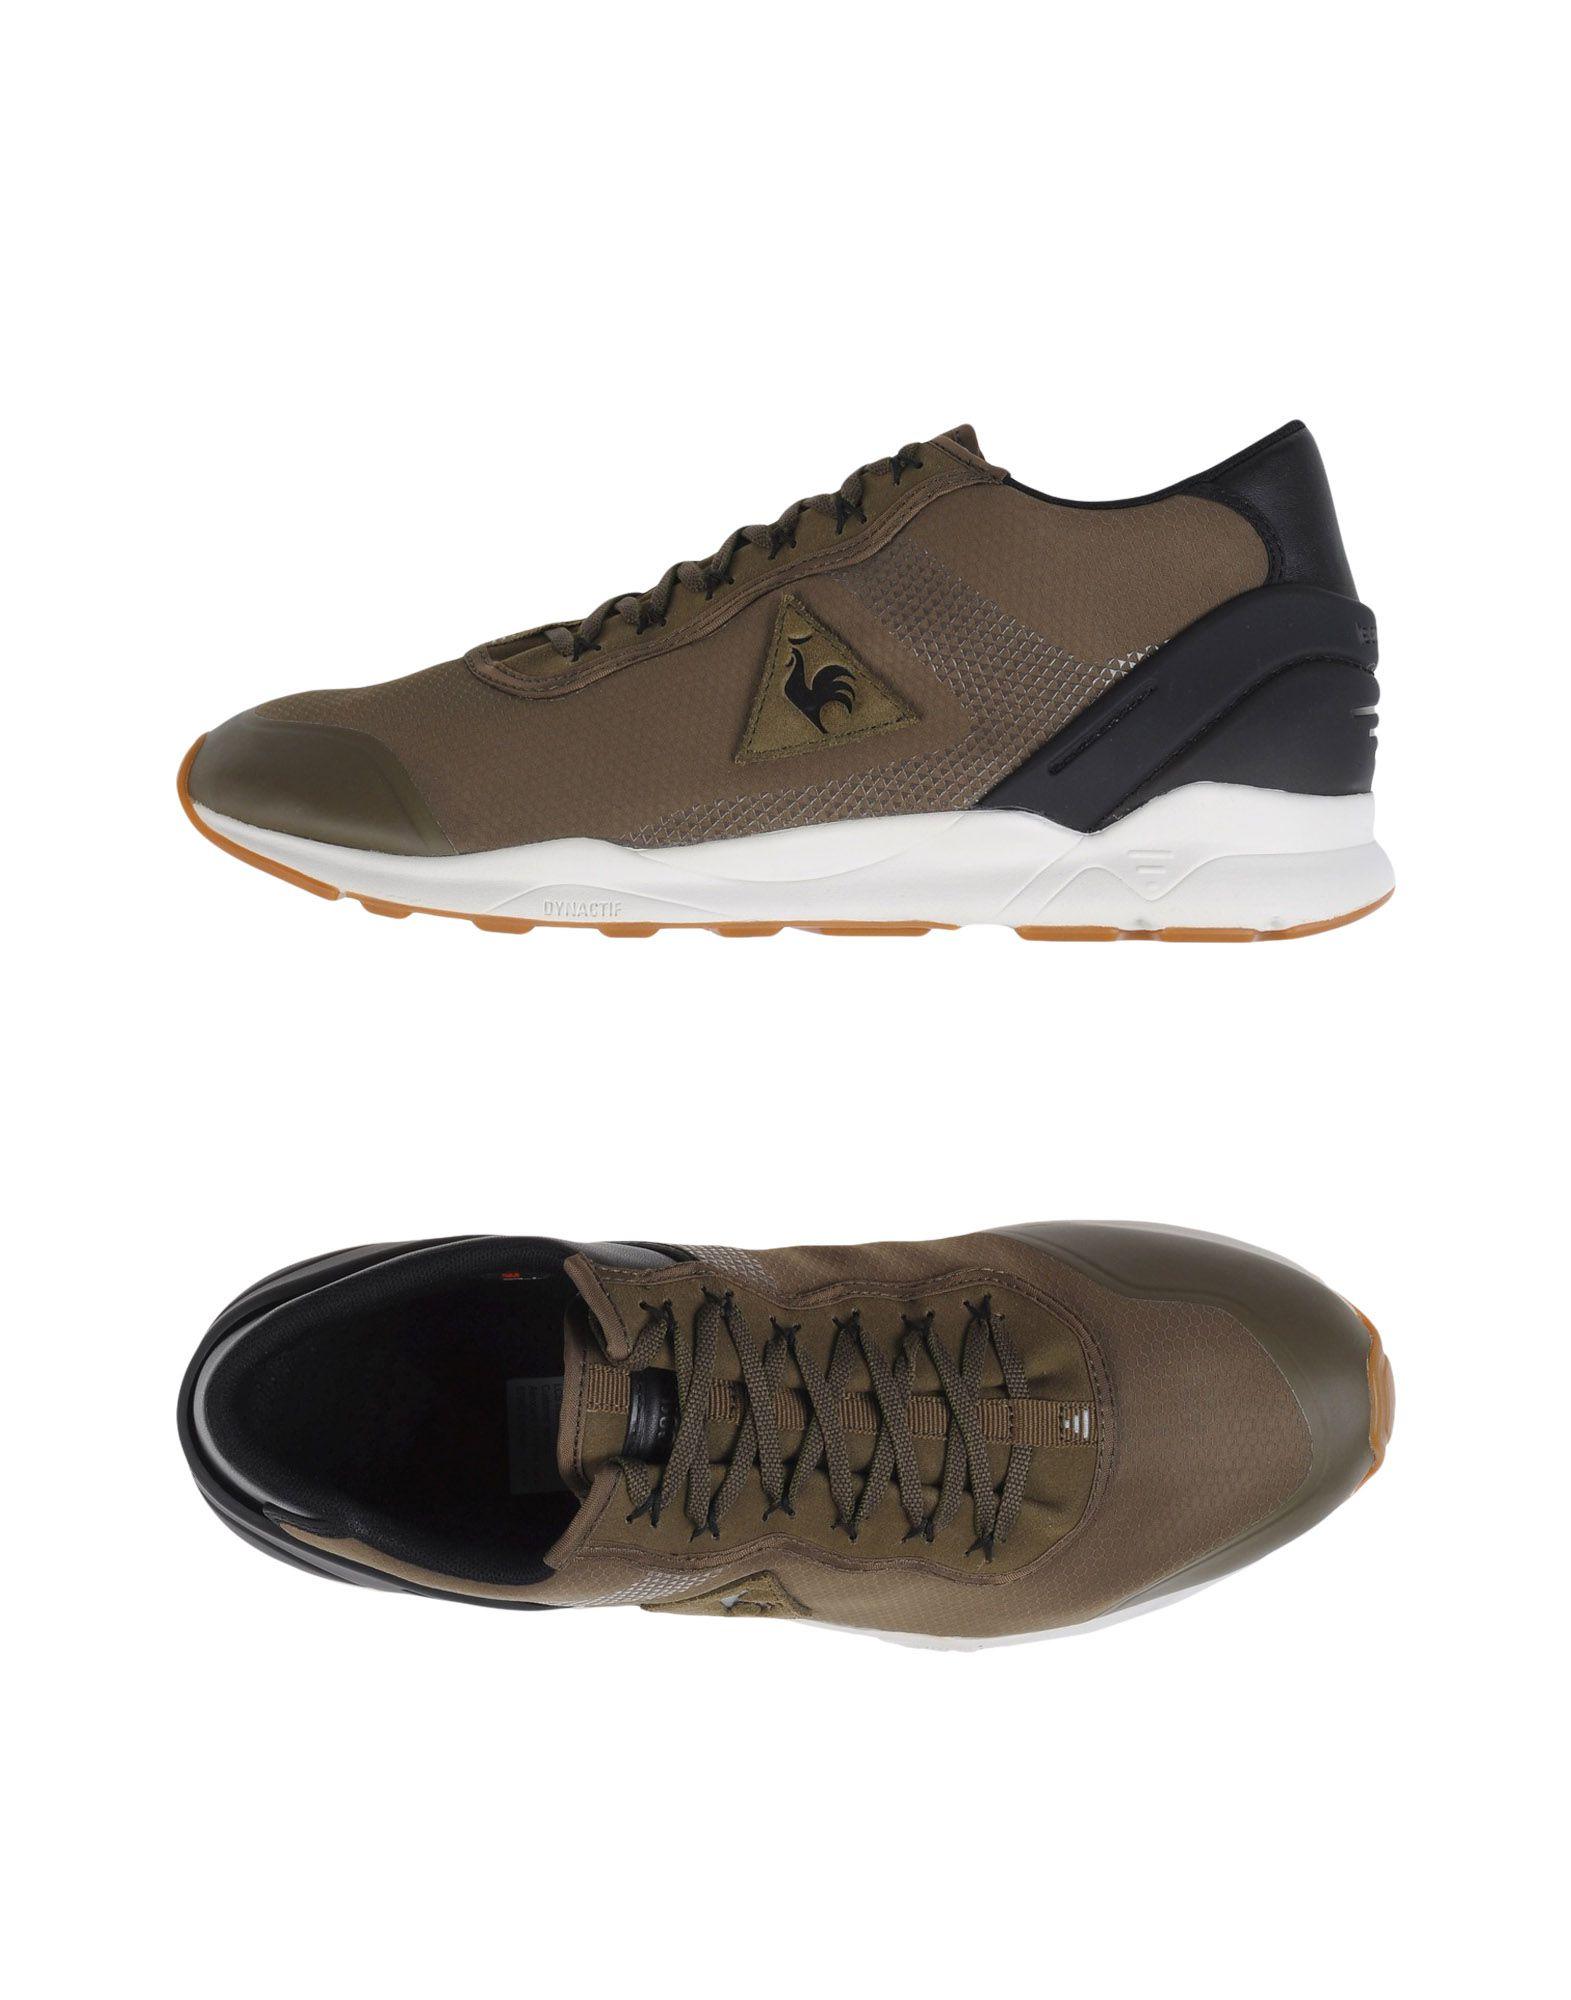 Sneakers Le Coq Sportif Lcr Xt C Winter - Uomo - 11157794KX